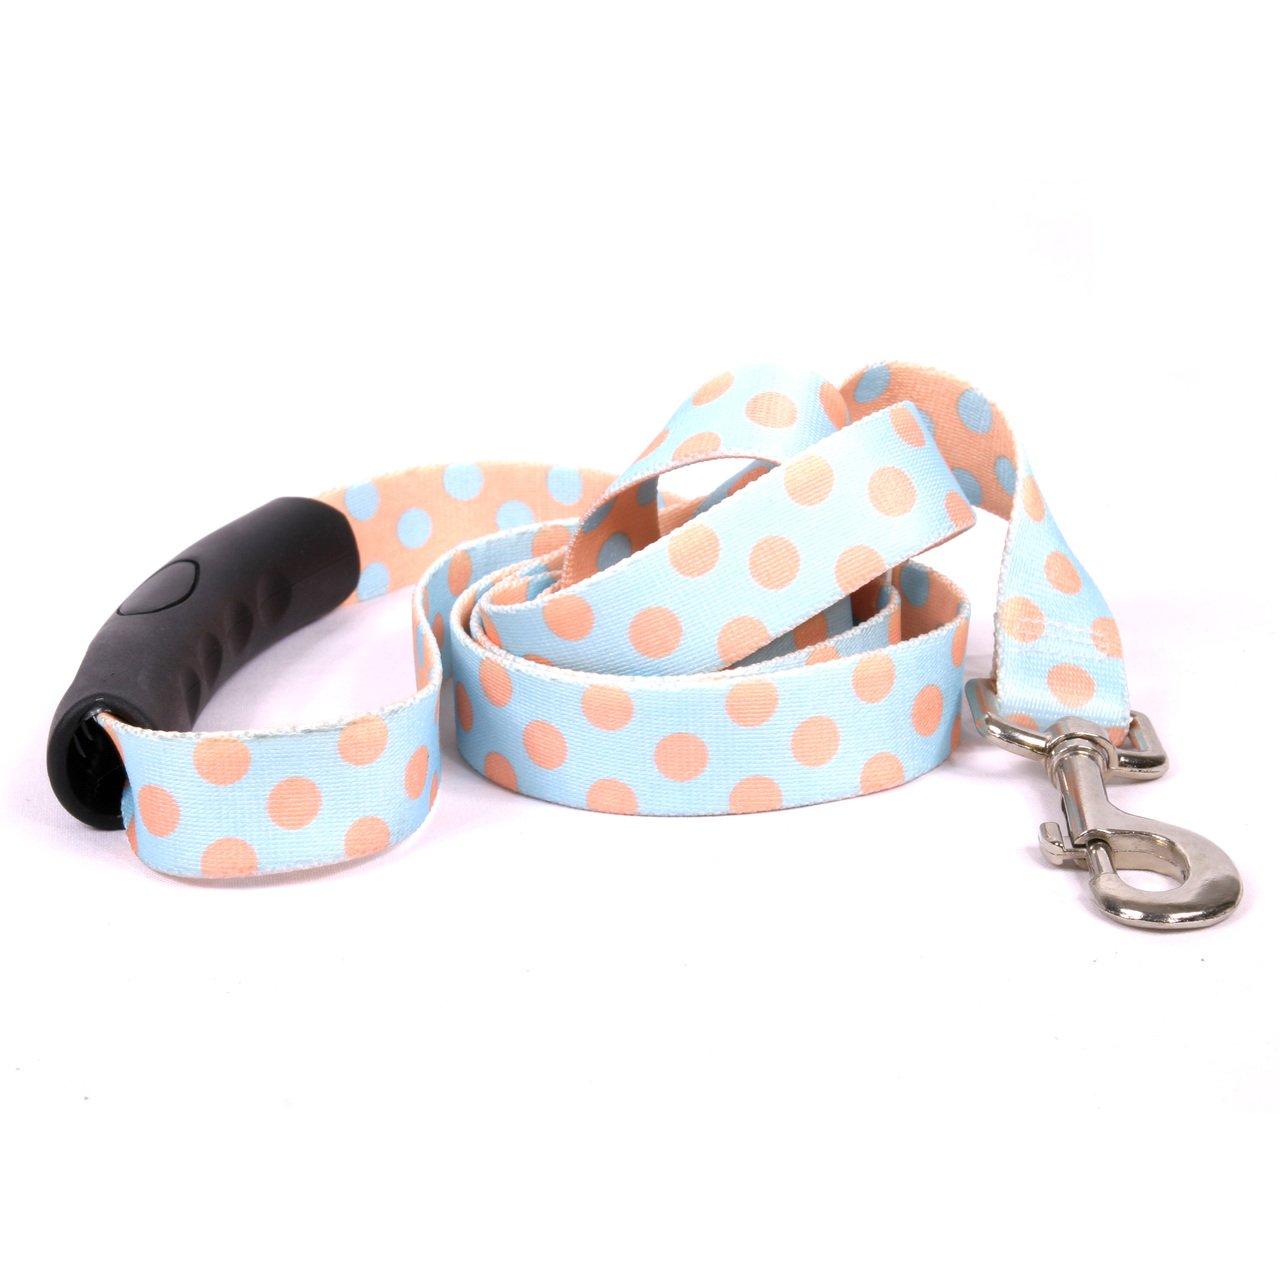 Yellow Dog Design Blue and Melon Polka Dot EZ-Grip Dog Leash with Comfort Handle, Small/Medium